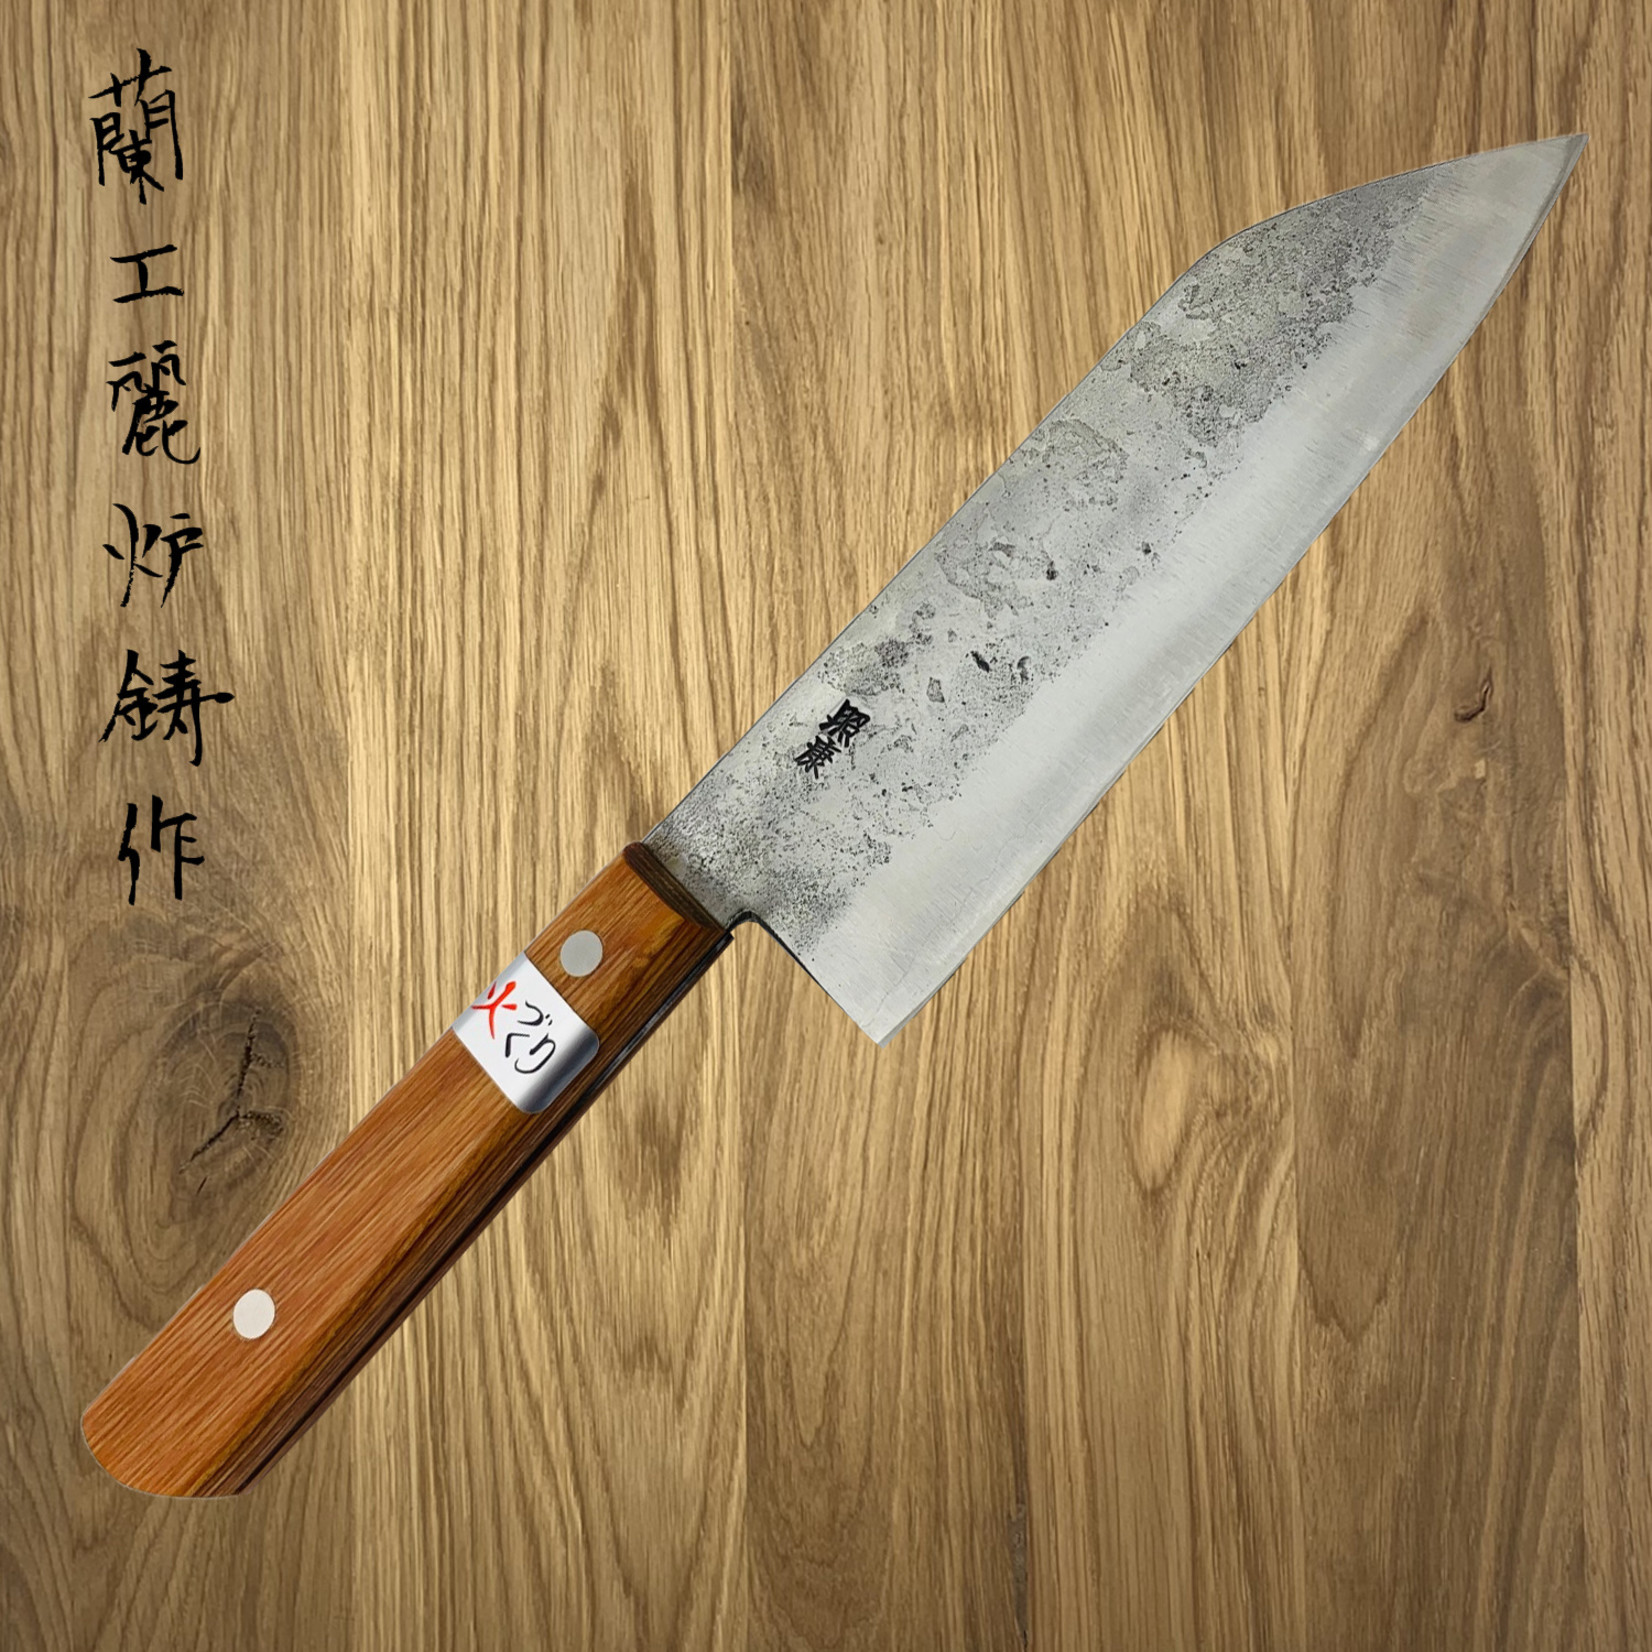 FUJIWARA Nashiji #1 santoku 165 mm Western handle